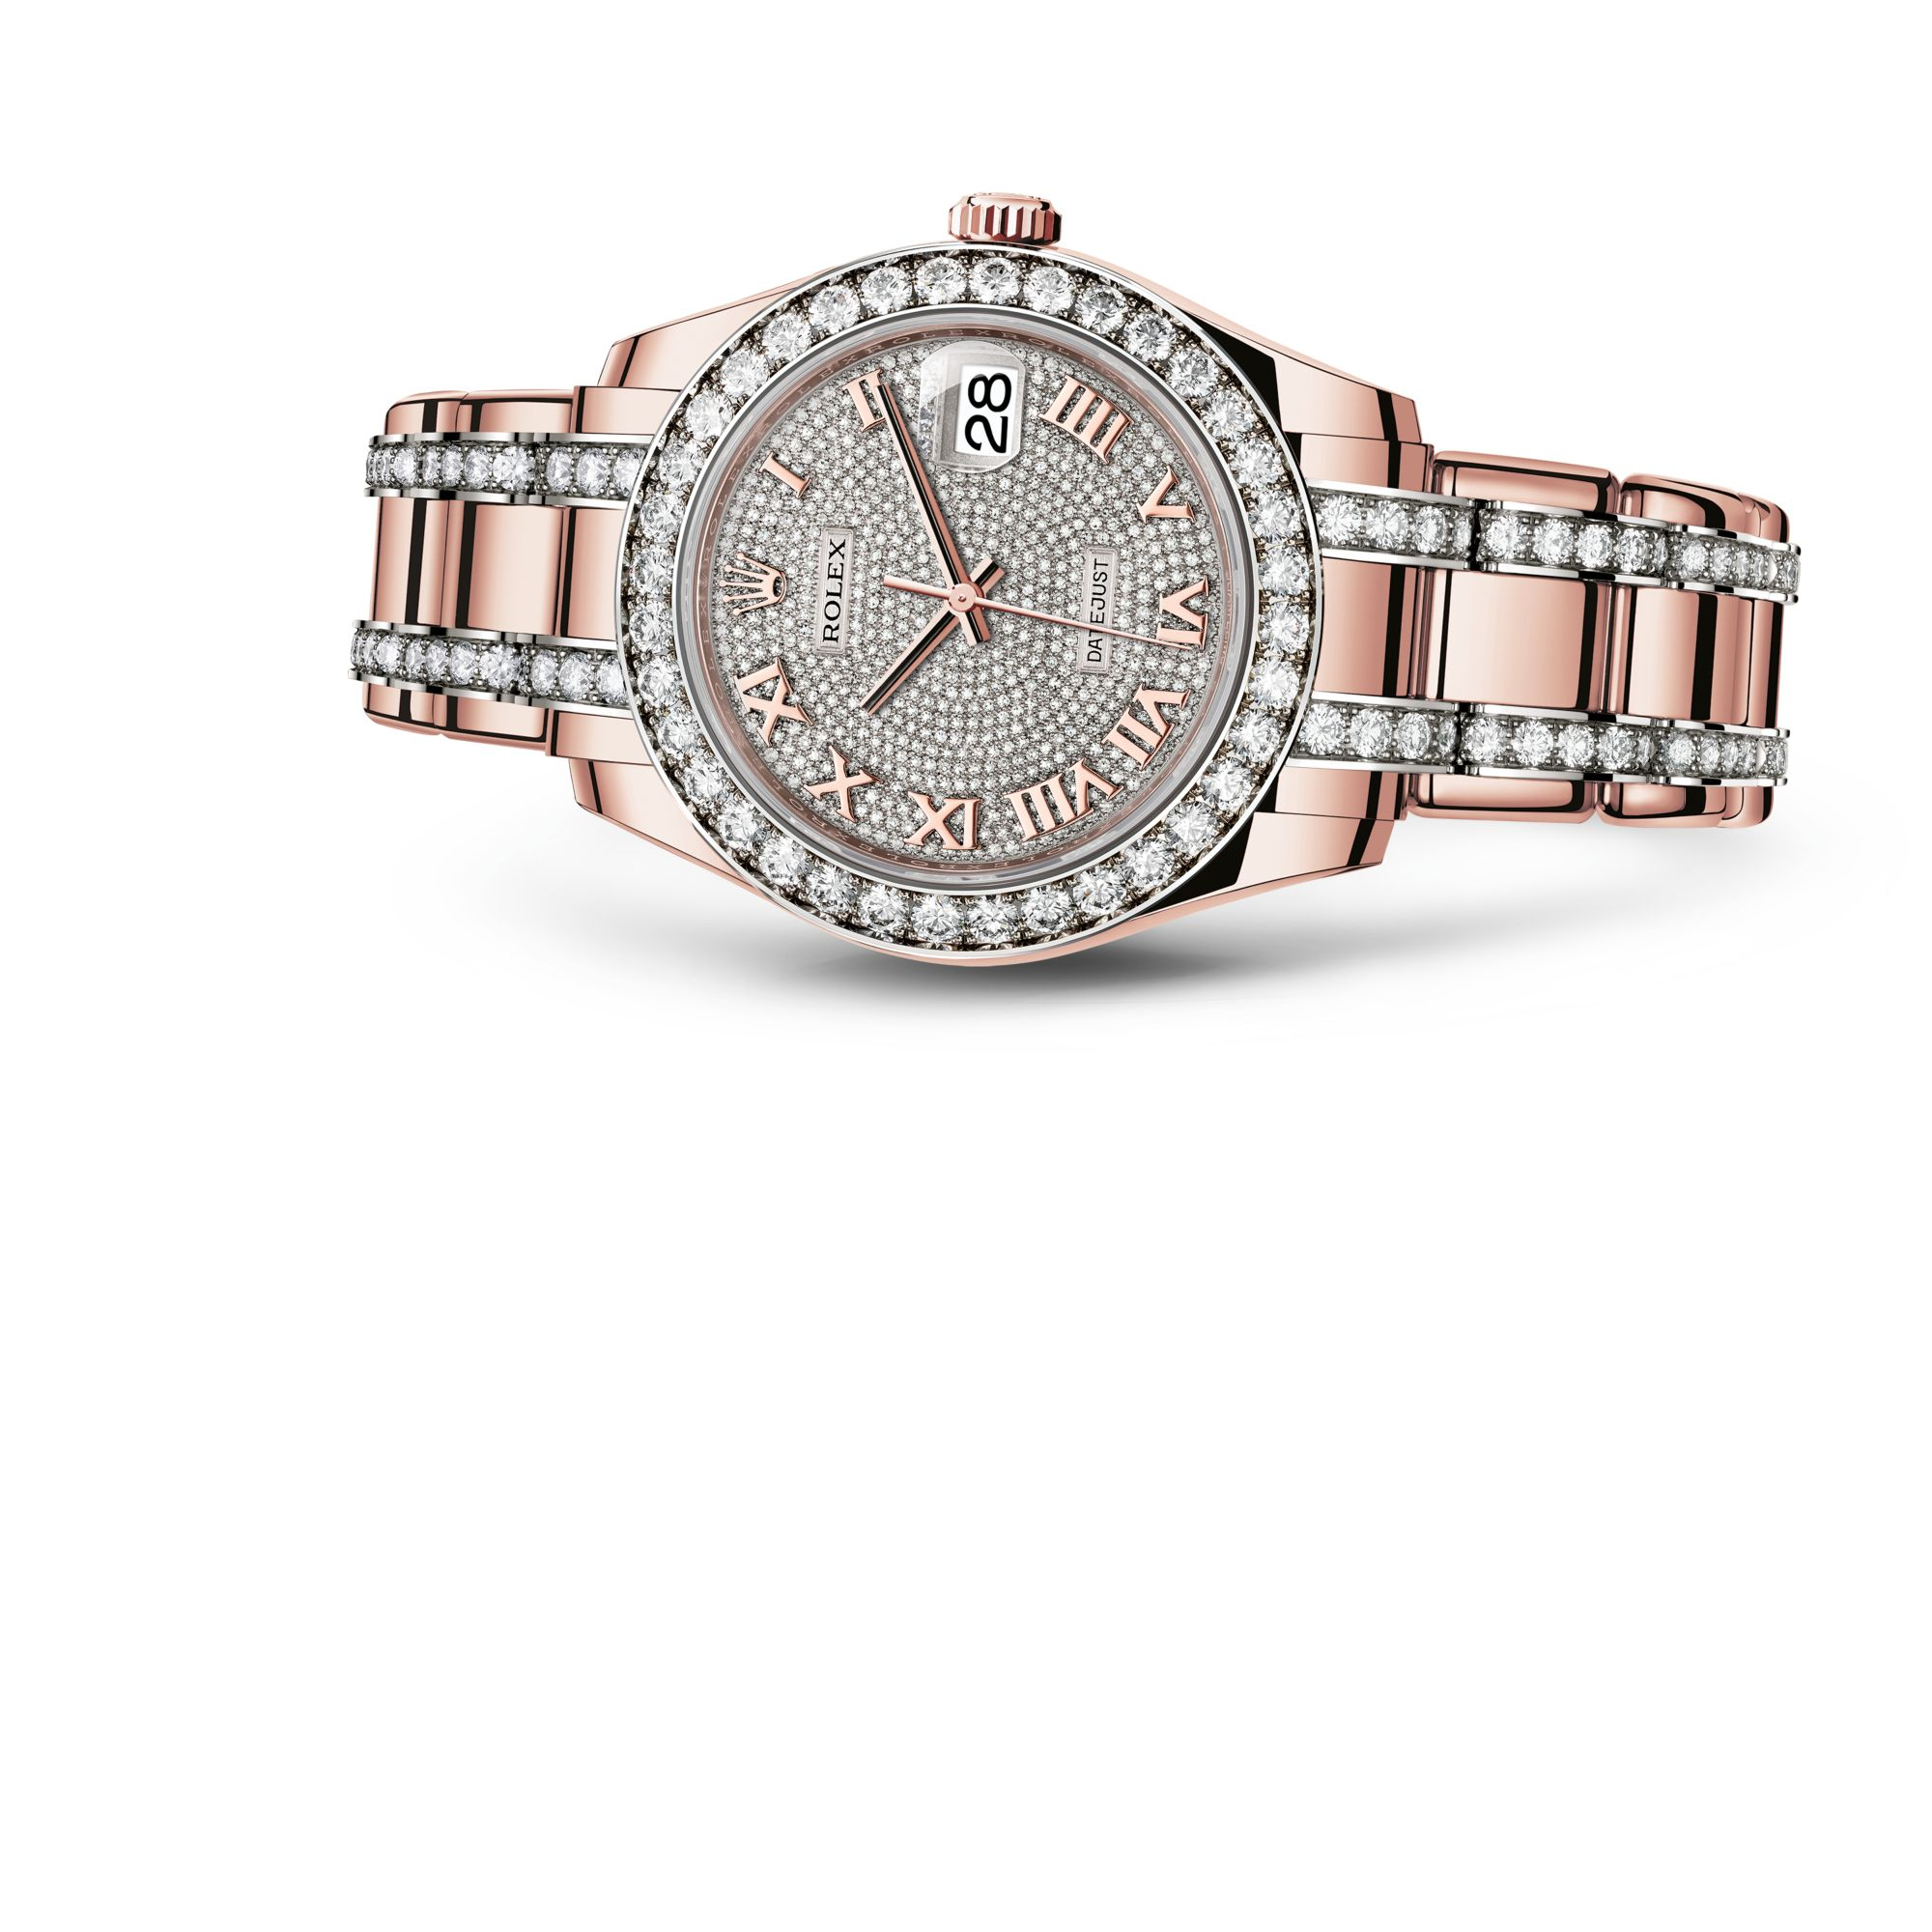 Rolex Pearlmaster 39 M86285-0001